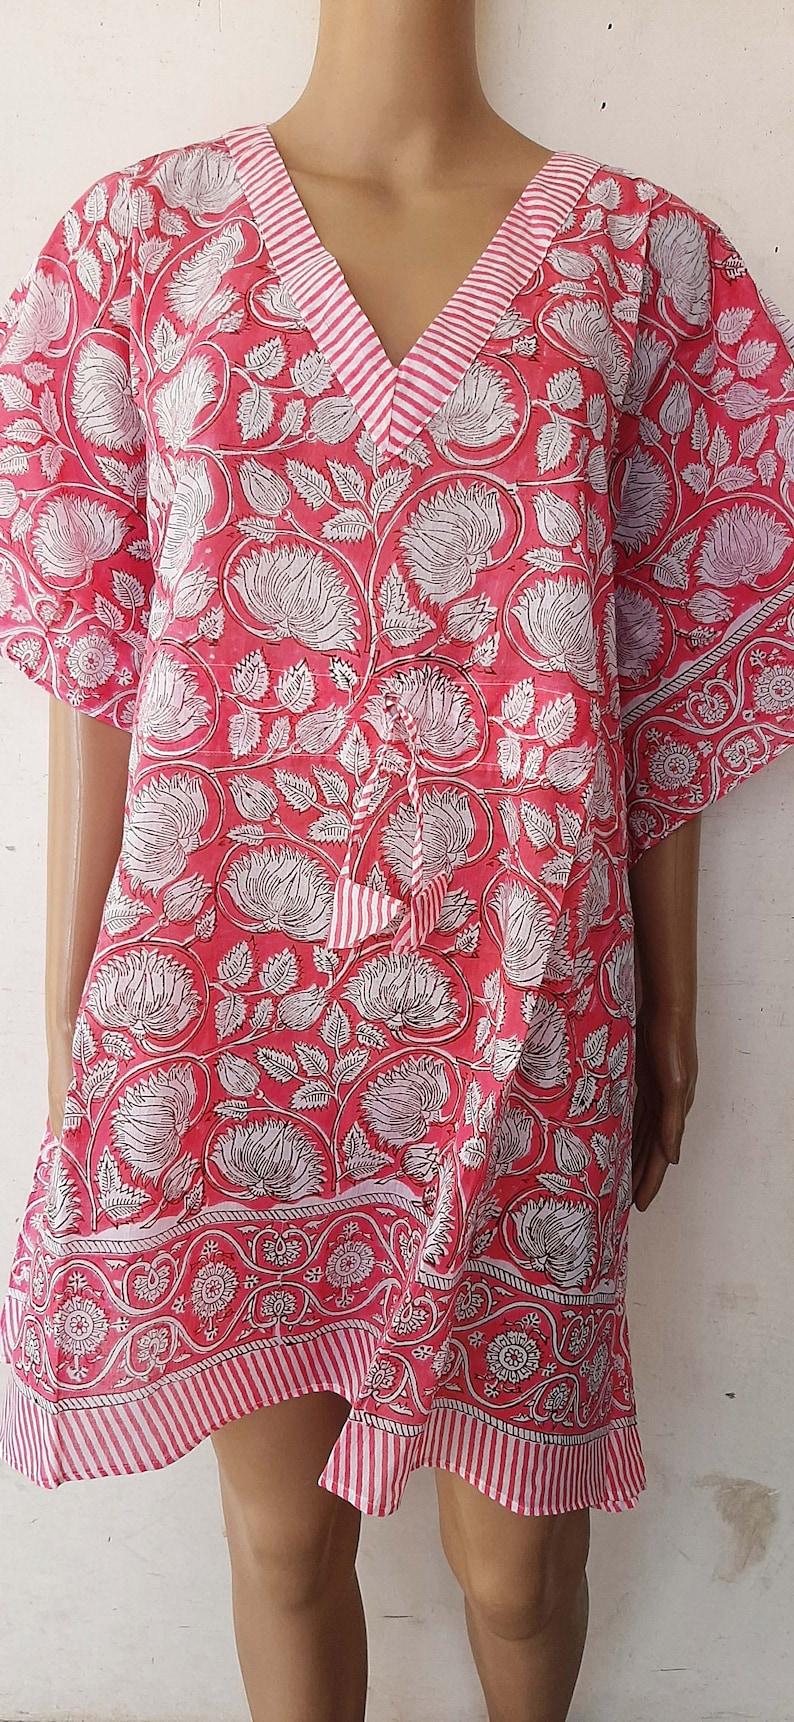 Indian Cotton Ethnic Soft Handmade Bohemian Short Kaftan Boho And Hippie Style Vintage Dressing Gown Bikini Beach Cover Up Hand Block Print